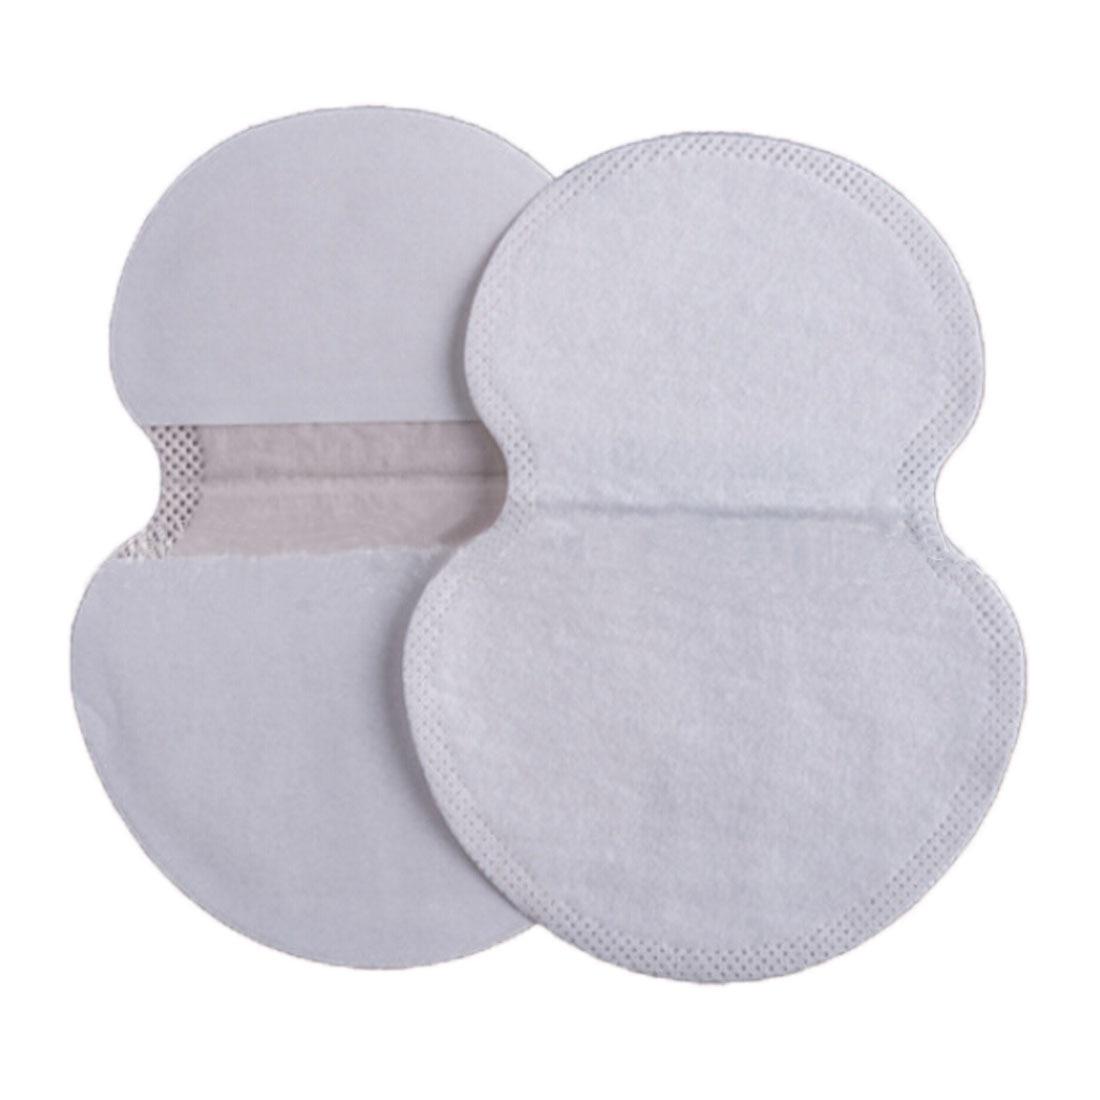 10/30/50pcs Summer Armpit Sweat Pads Underarm Deodorants Stickers Absorbing Disposable Anti Perspiration Patch Wholesale